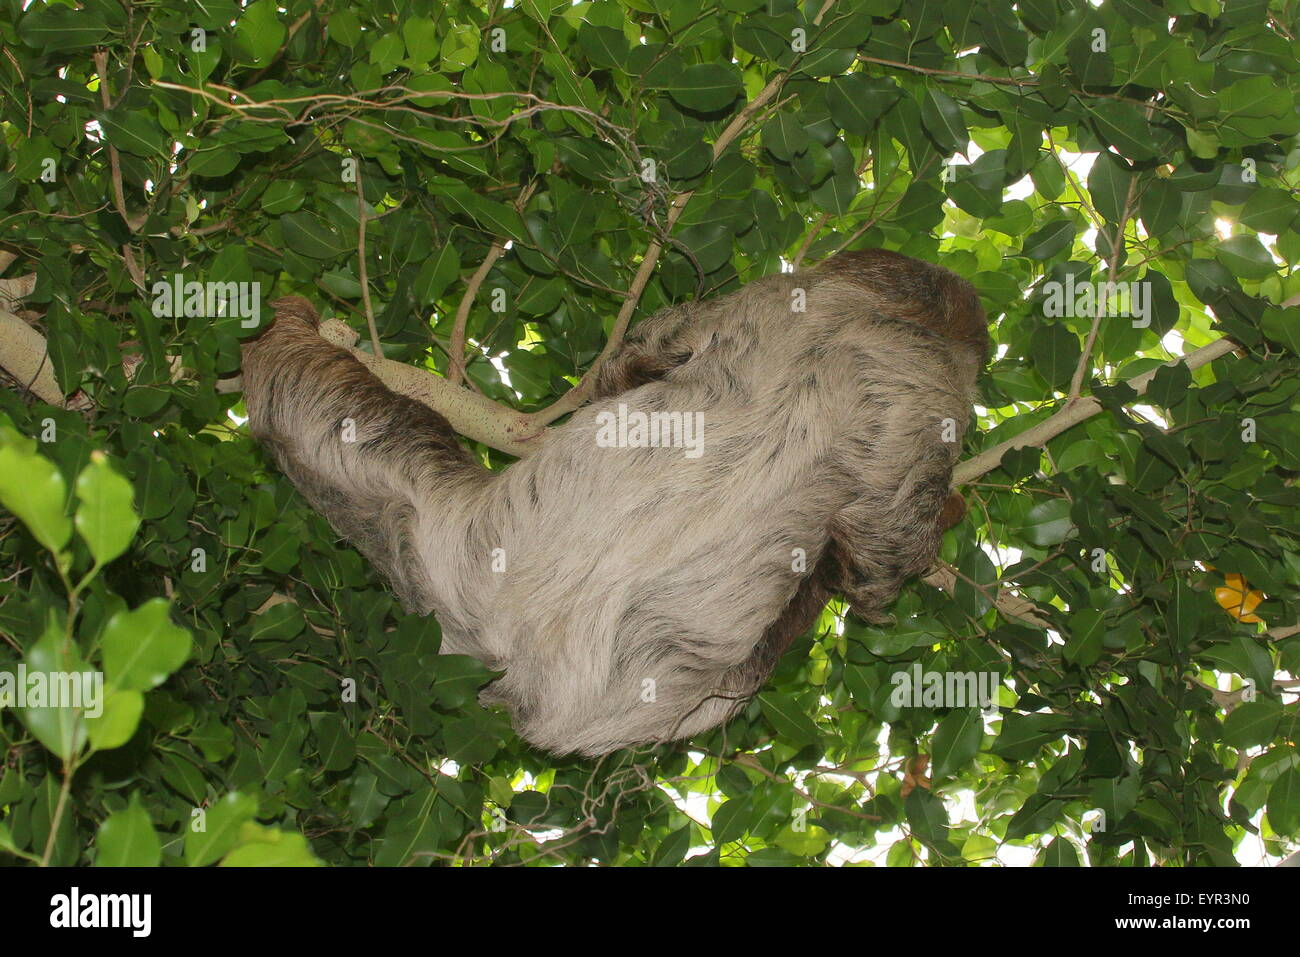 South American Linnaeus zwei toed Sloth oder südlichen zwei – Finger Faultier (Choloepus Didactylus) Stockfoto